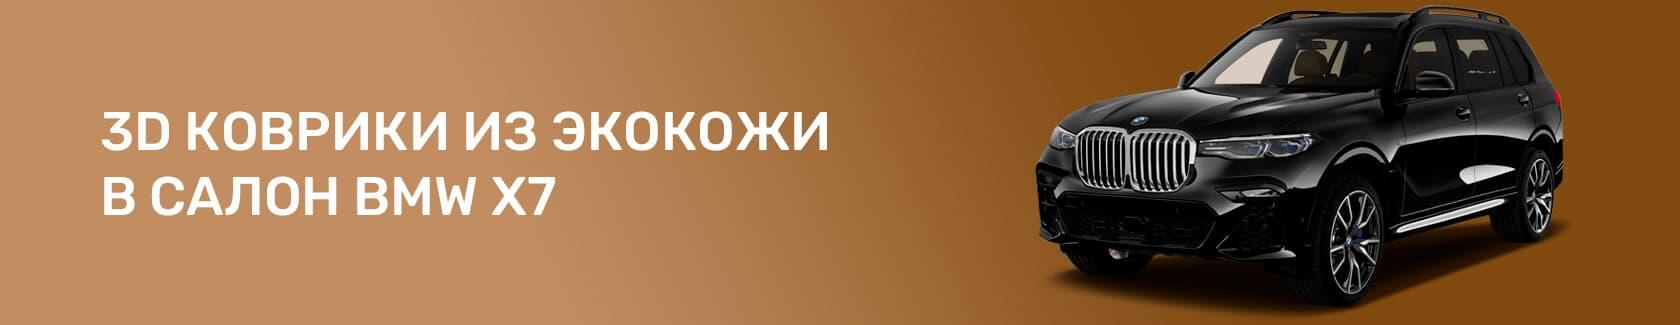 Шапка для фотоколлажа Hyundai Sonata